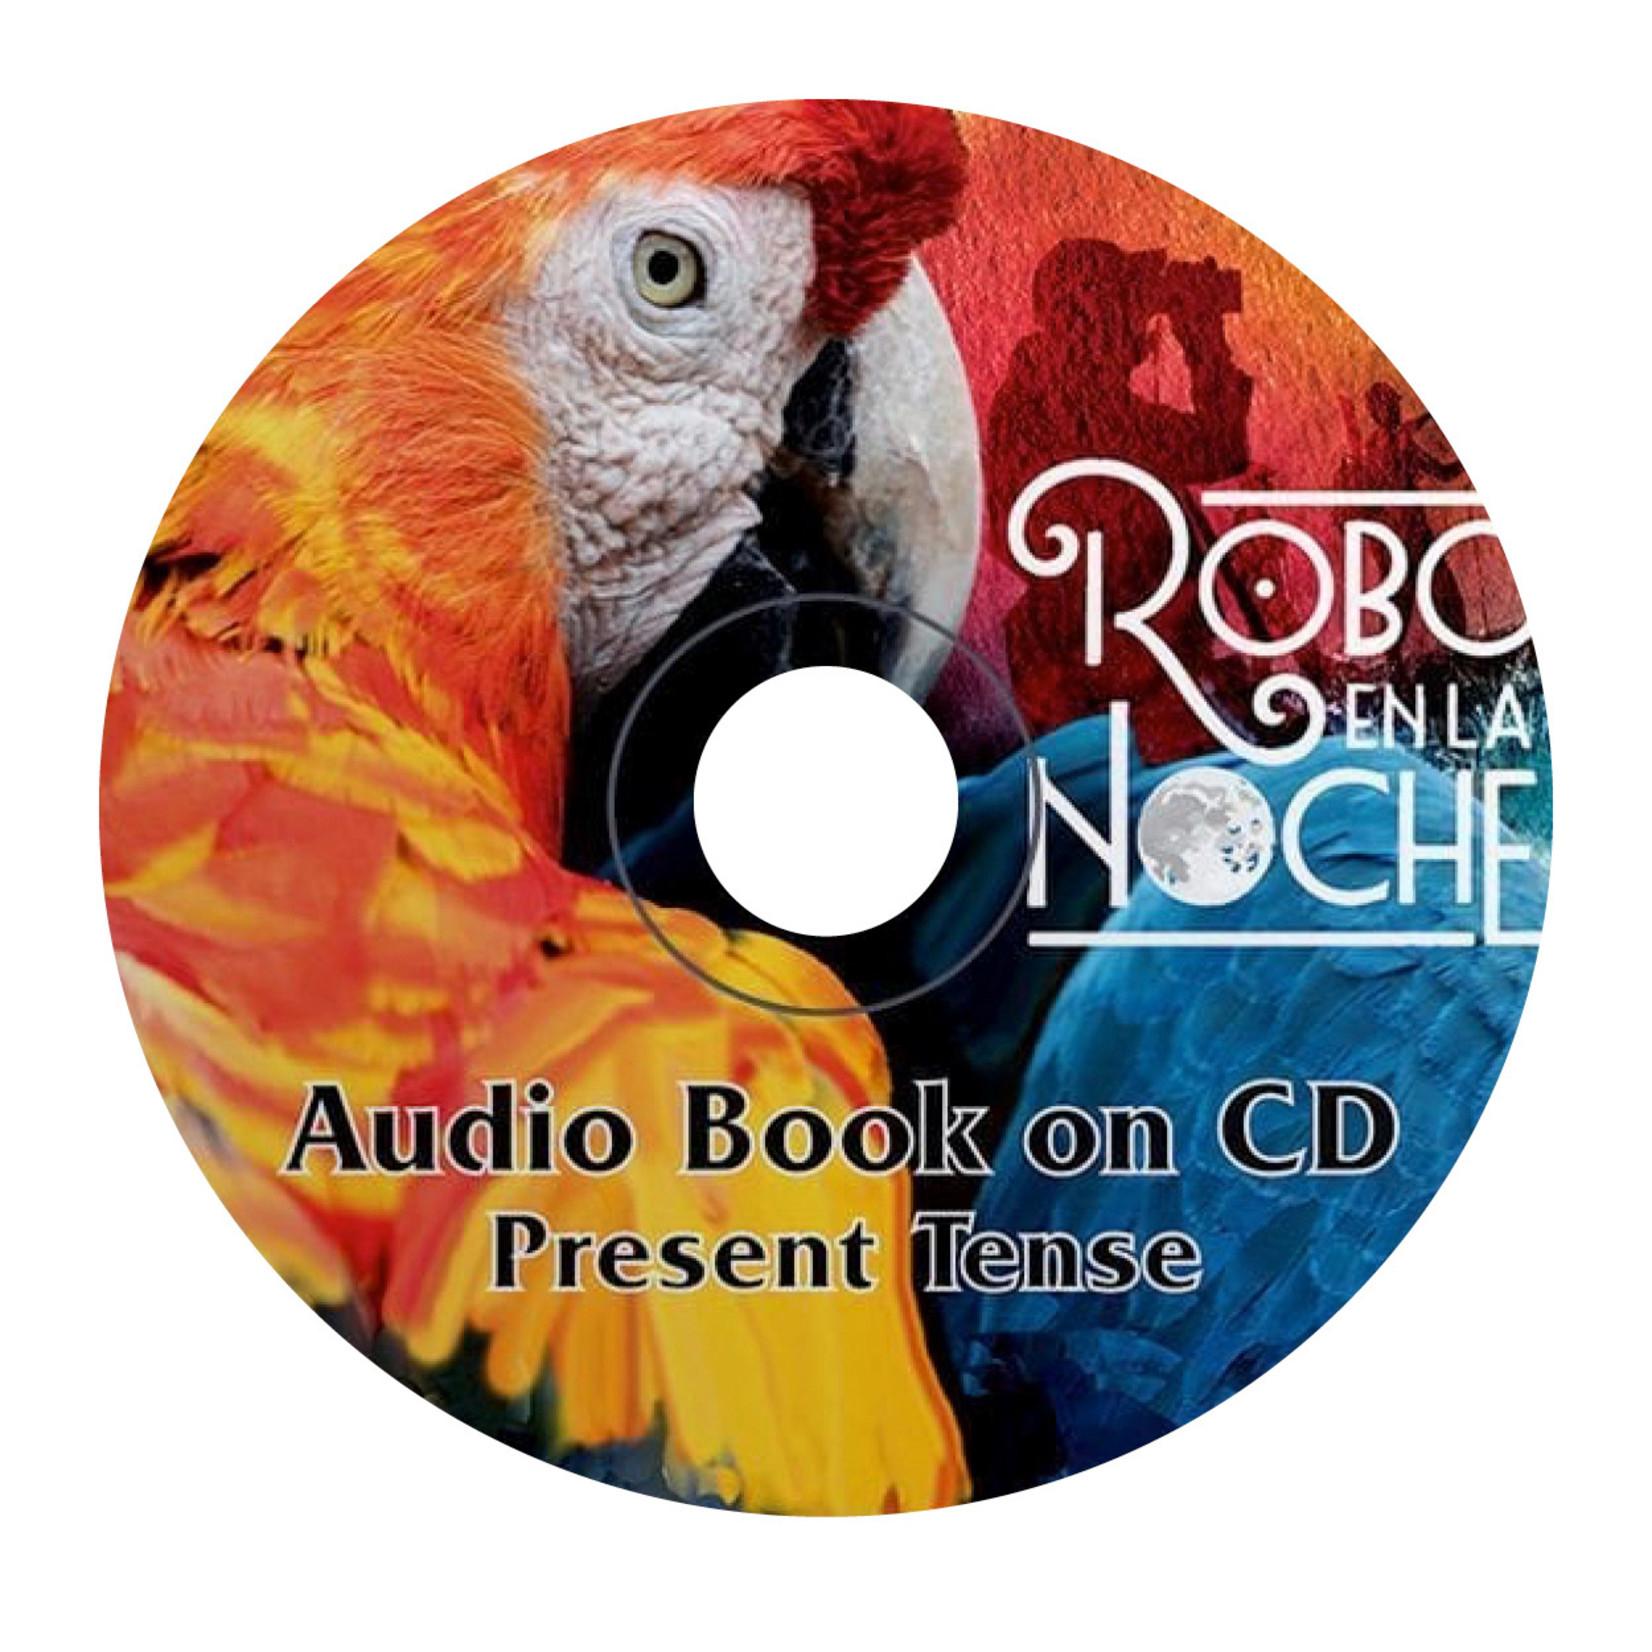 Fluency Matters Robo en la noche - Audiobook